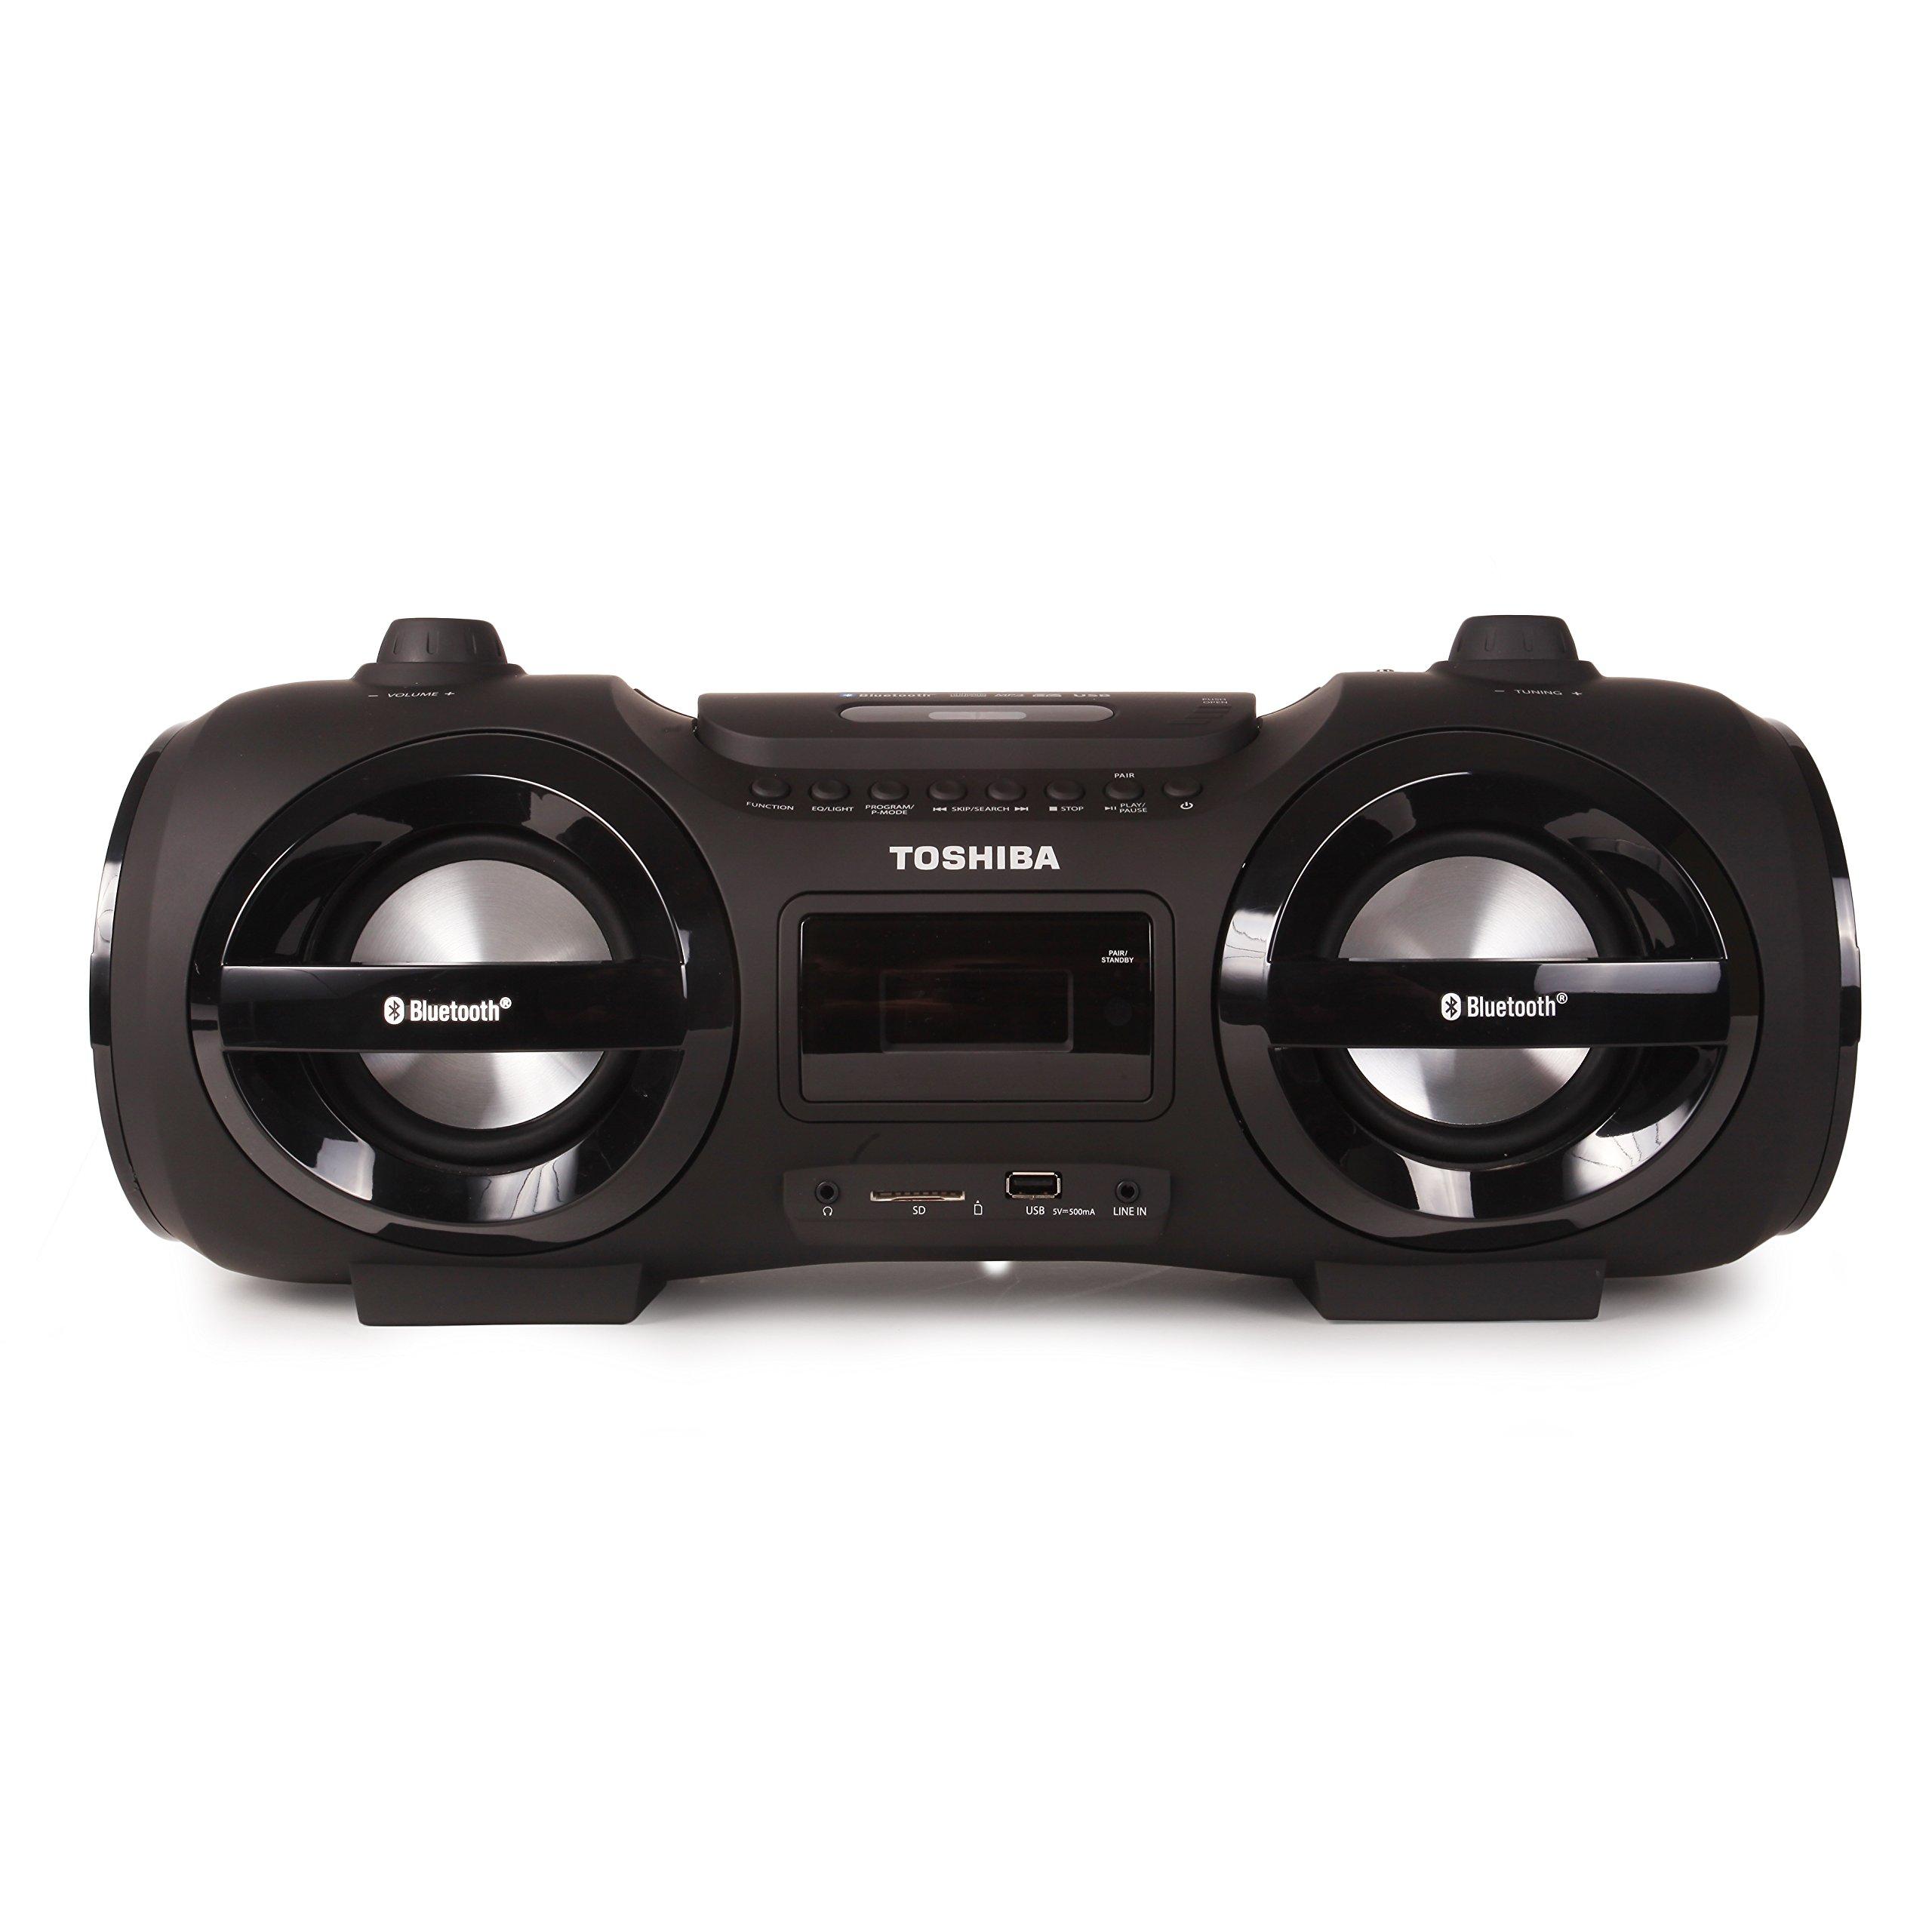 Toshiba Wireless Bluetooth Boombox Speaker: Portable CD Boom Box with FM Radio, Remote & LED Lights